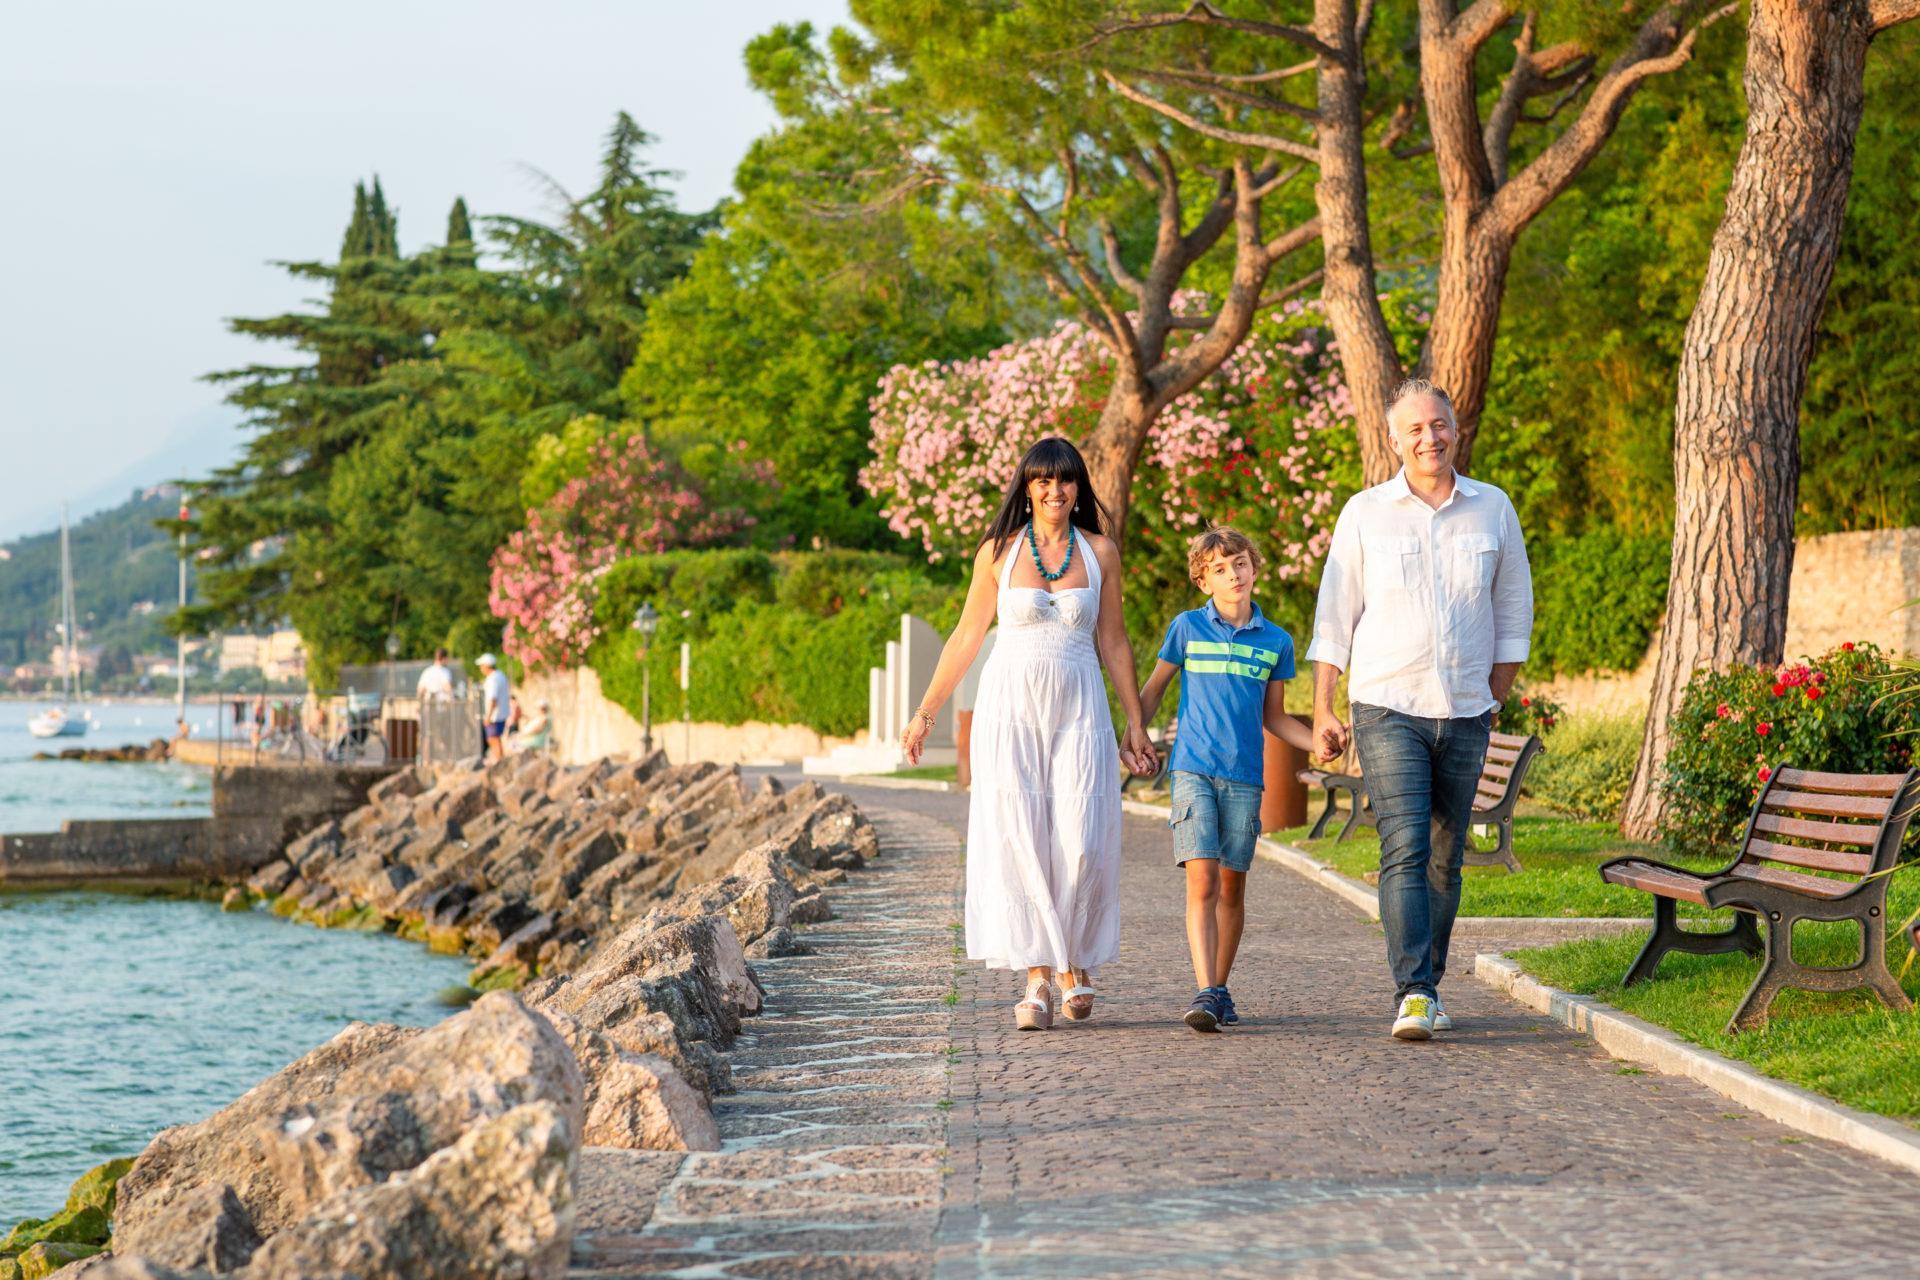 Wedding Photographer Lake Garda Verona servizi fotografici GLPSTUDIO FOTO VIDEO LAZISE CELL. 335 5234158